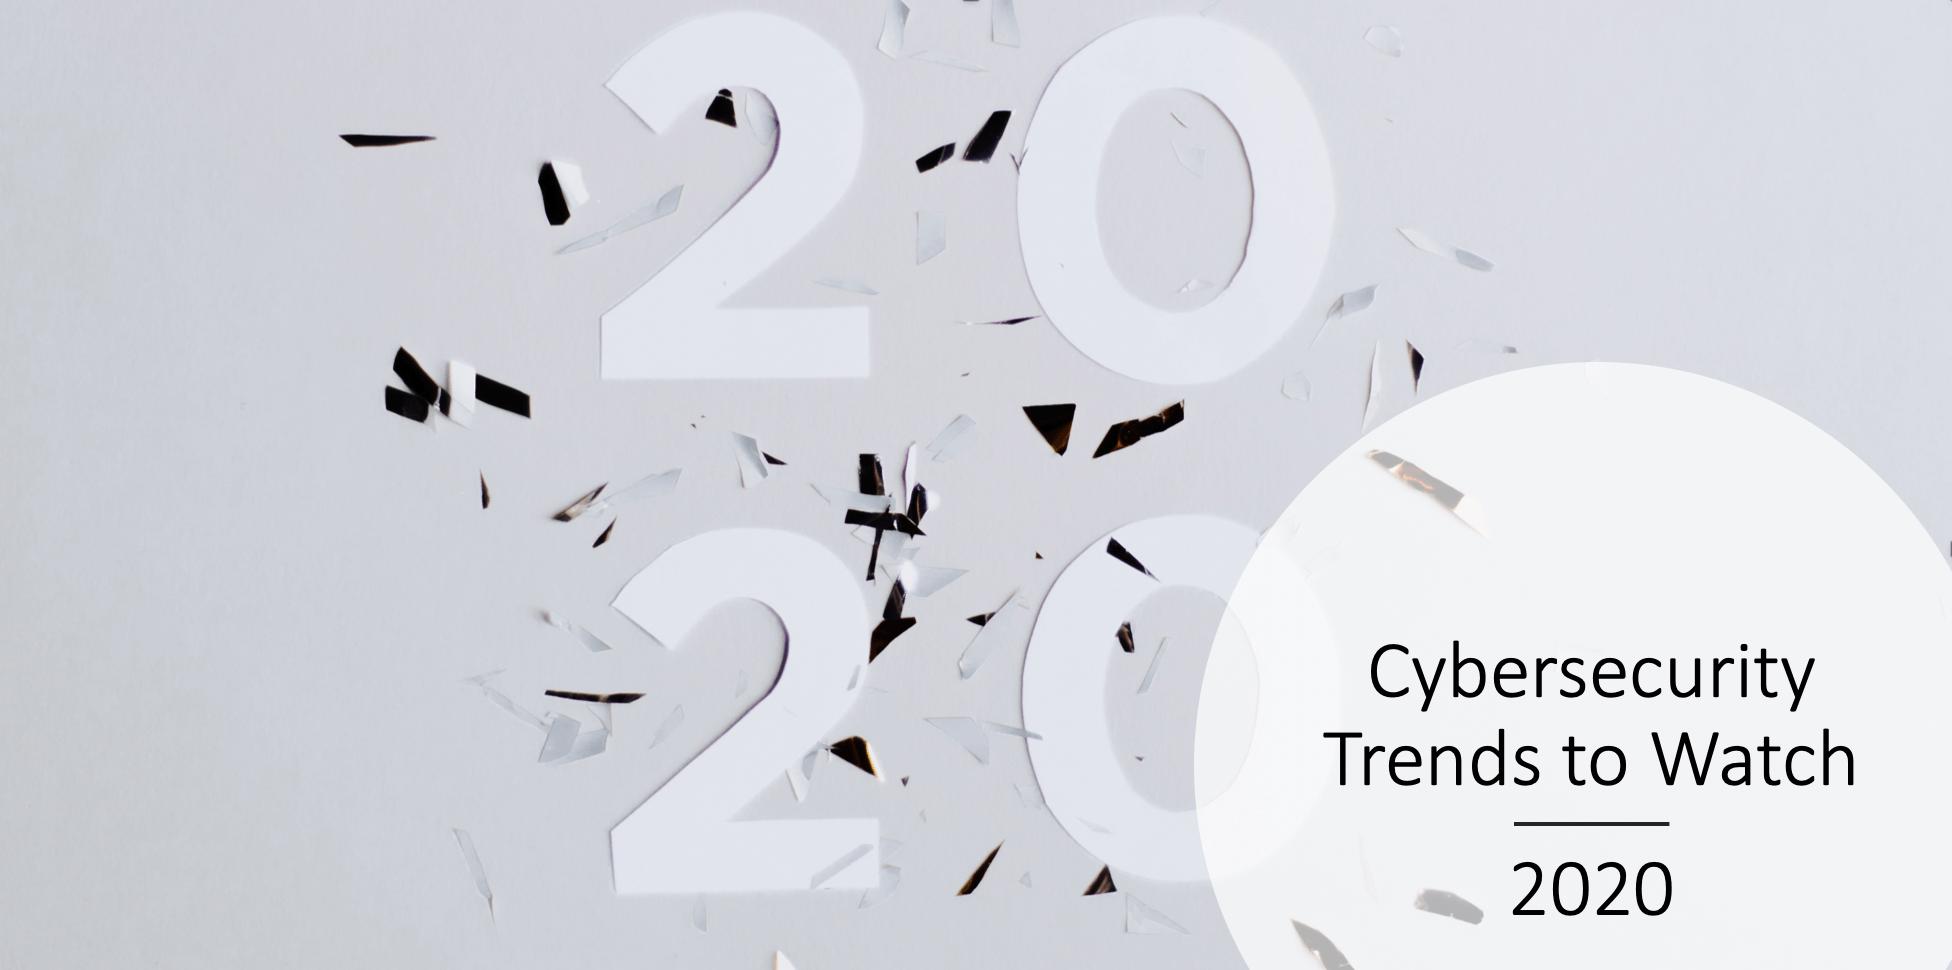 Cybersecurity Trends to Watch in 2020: https://www.enzoic.com/cybersecurity-trends-2020/